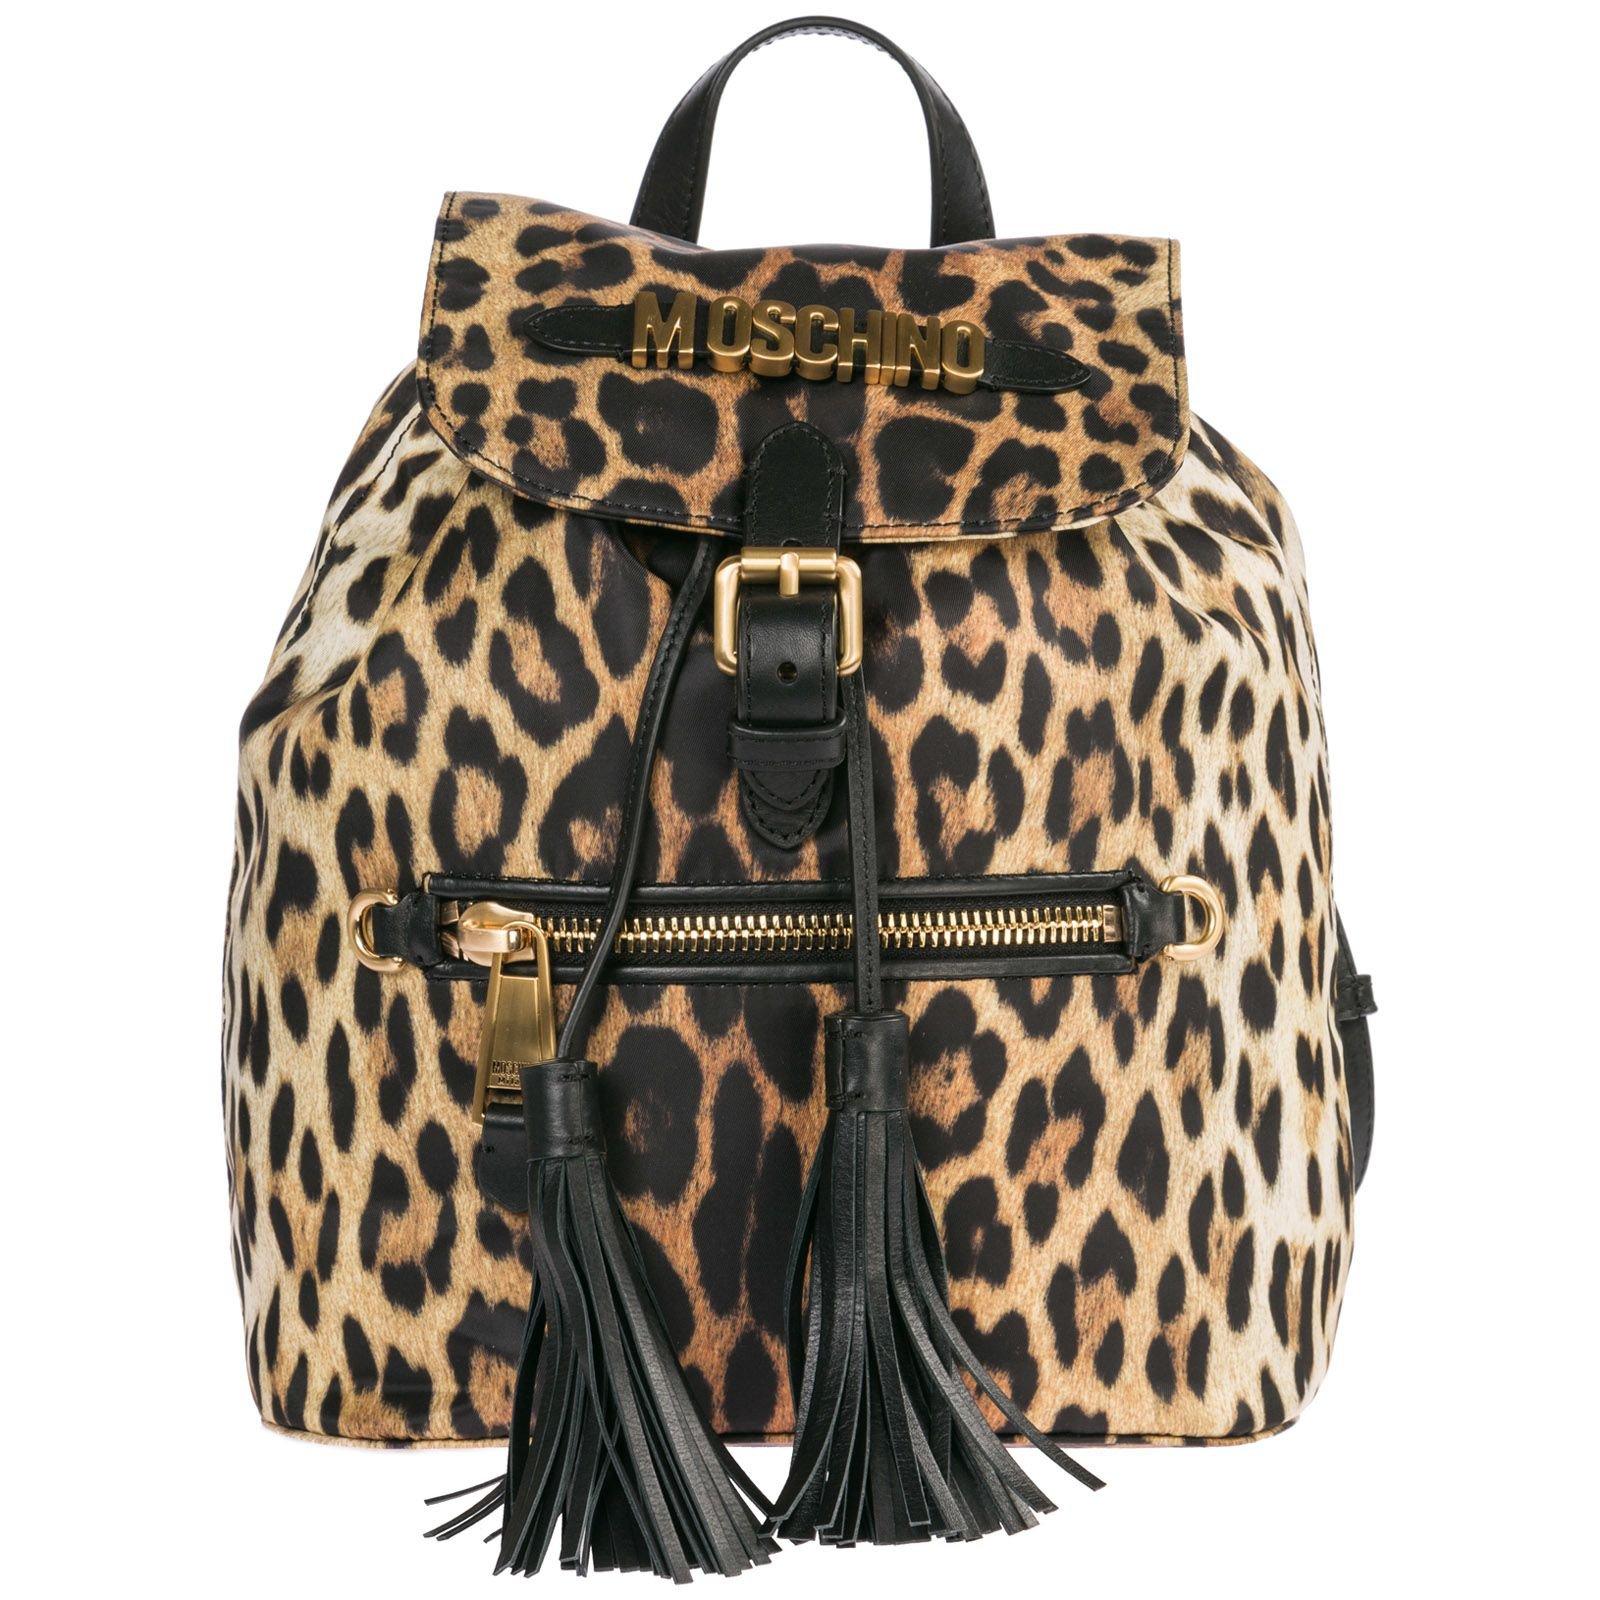 Moschino Rucksack Backpack Travel Leopard